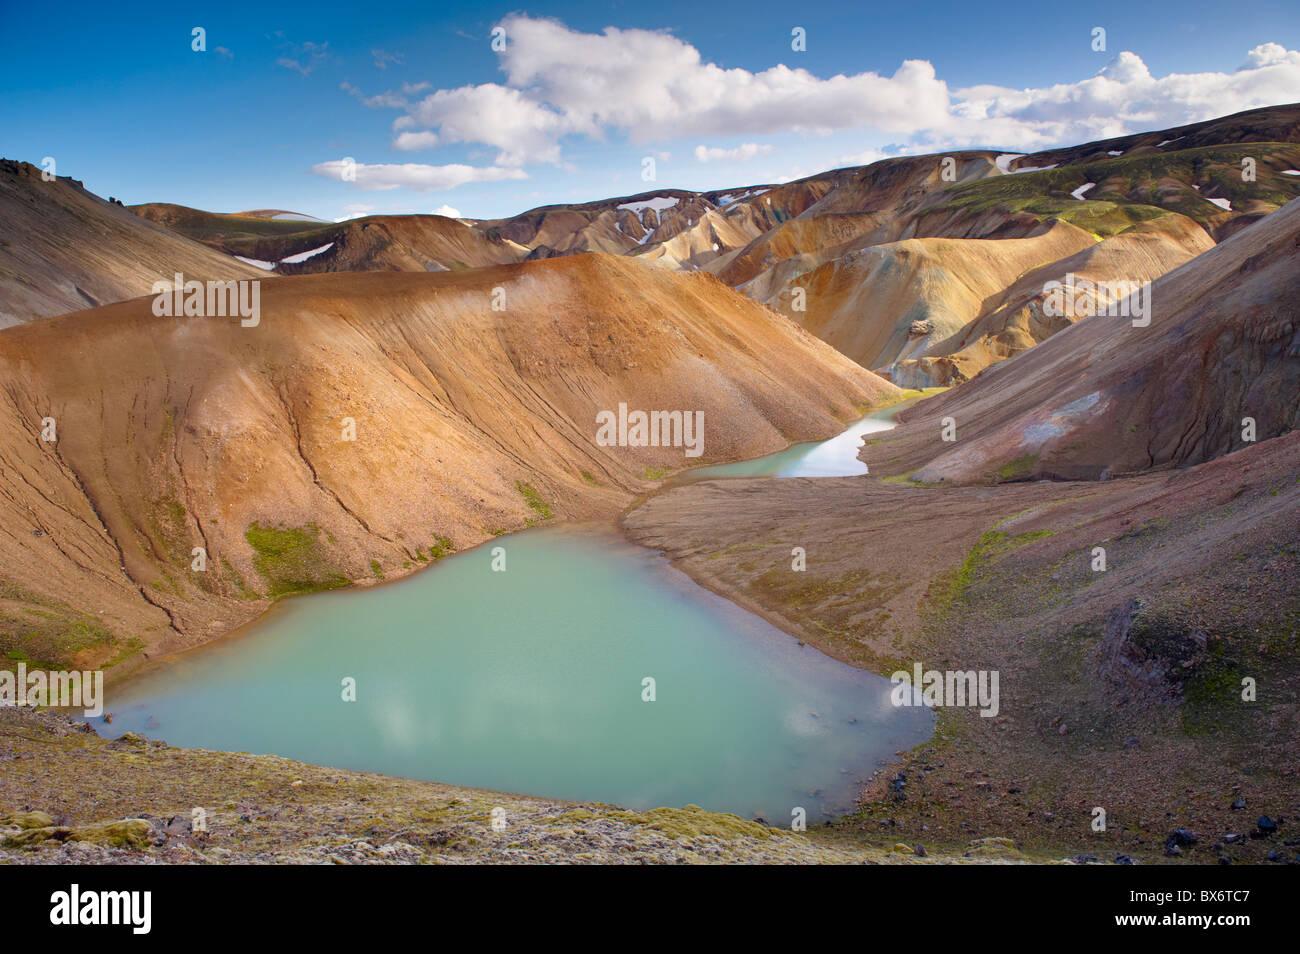 Rhyolite slopes and screes in Graenagil ravine, Landmannalaugar area, Fjallabak region, Iceland, Polar Regions - Stock Image